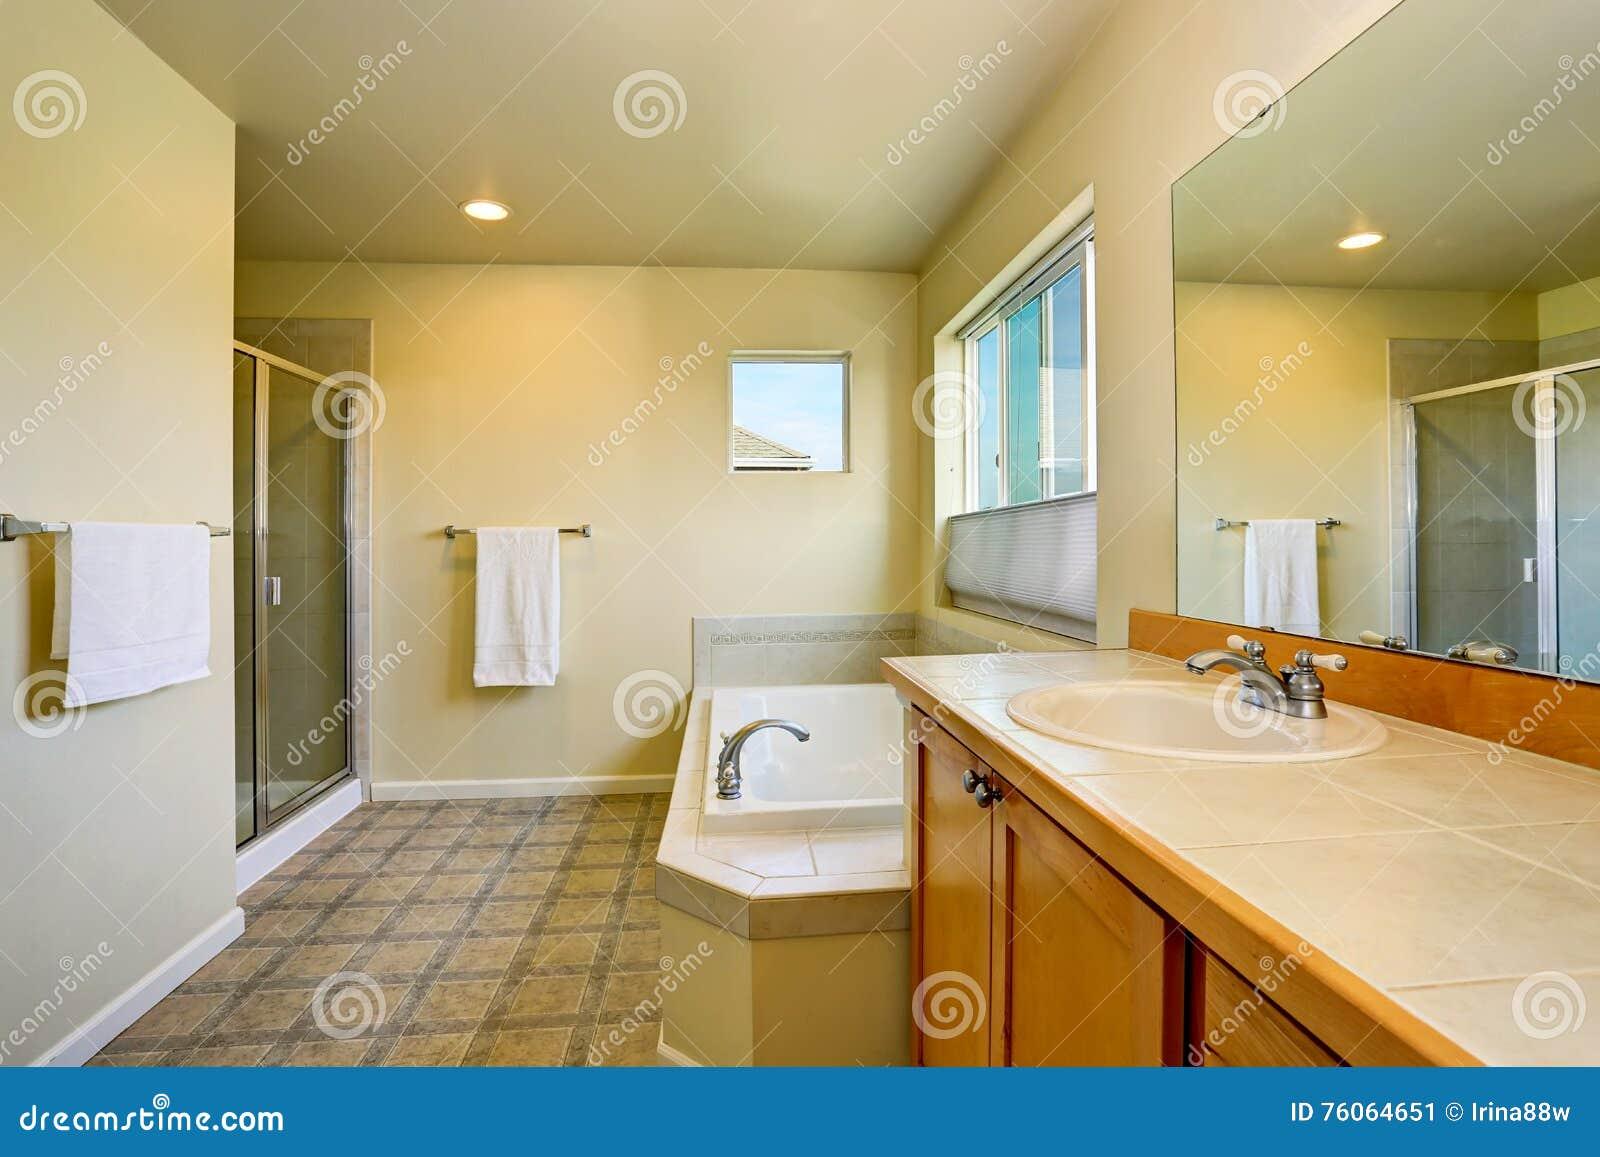 Bathroom Interior With Vanity Cabinet, Big Mirror And White Bath Tub ...